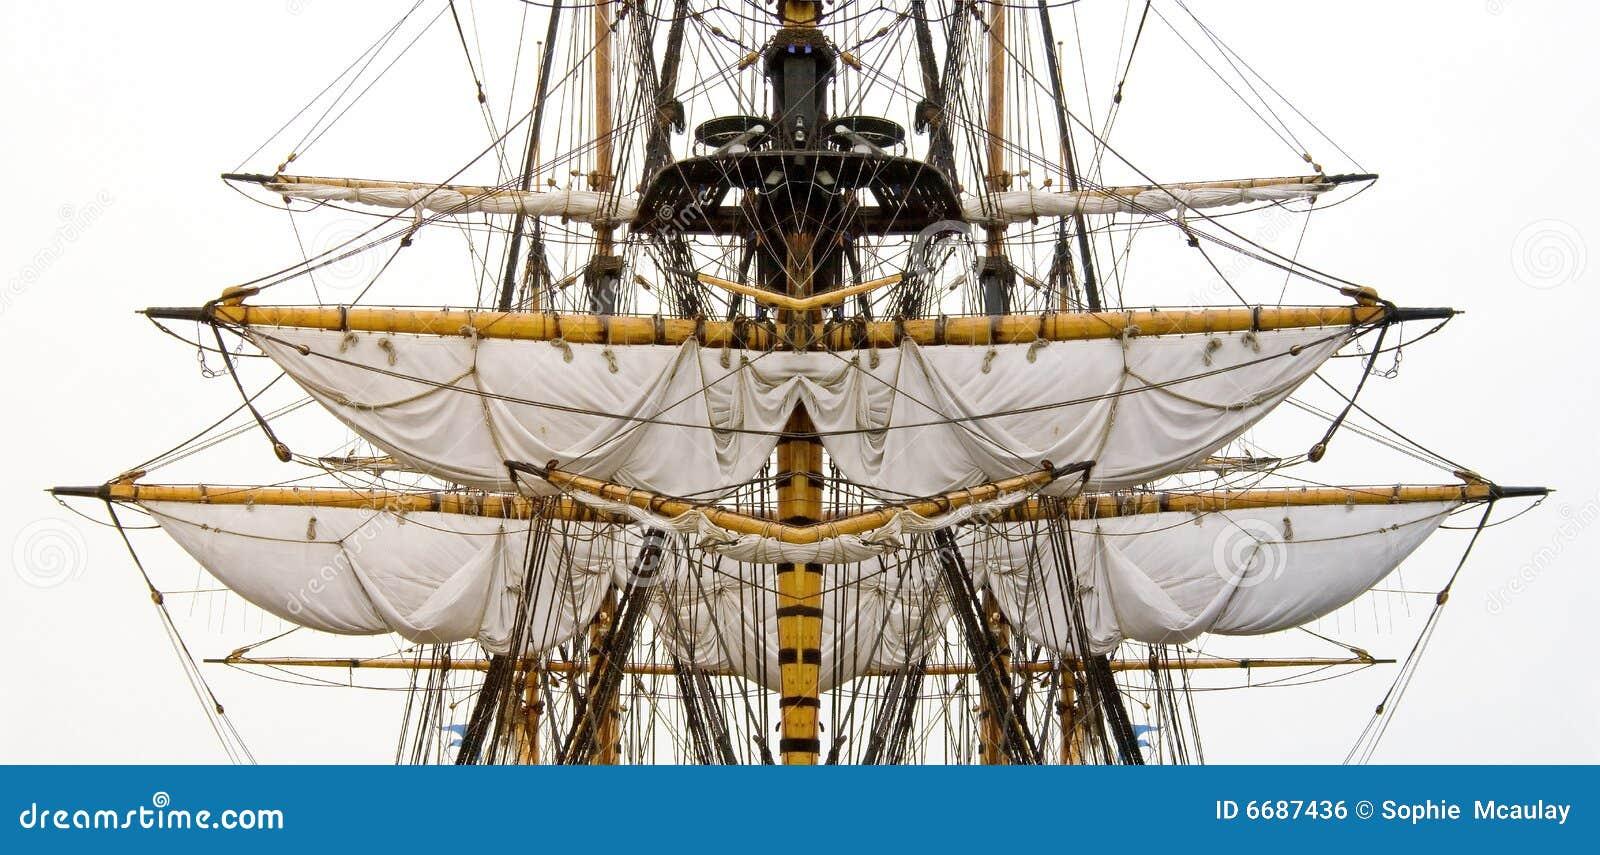 Old Ship Sails Amp Masts Royalty Free Stock Image Image